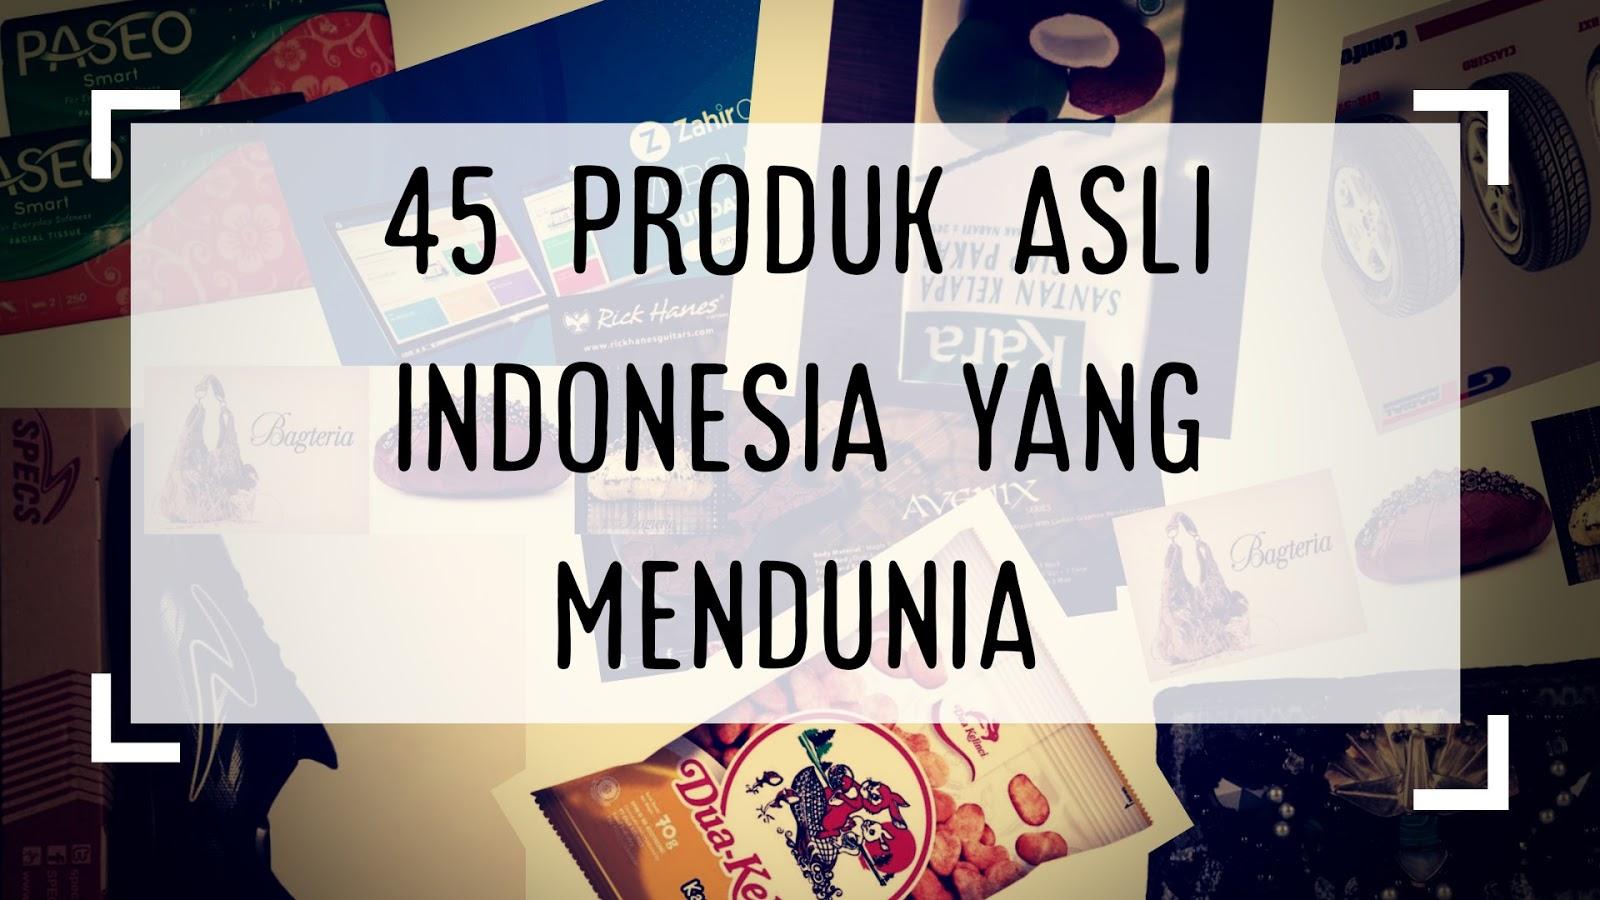 Produk asli indonesia yang mendunia